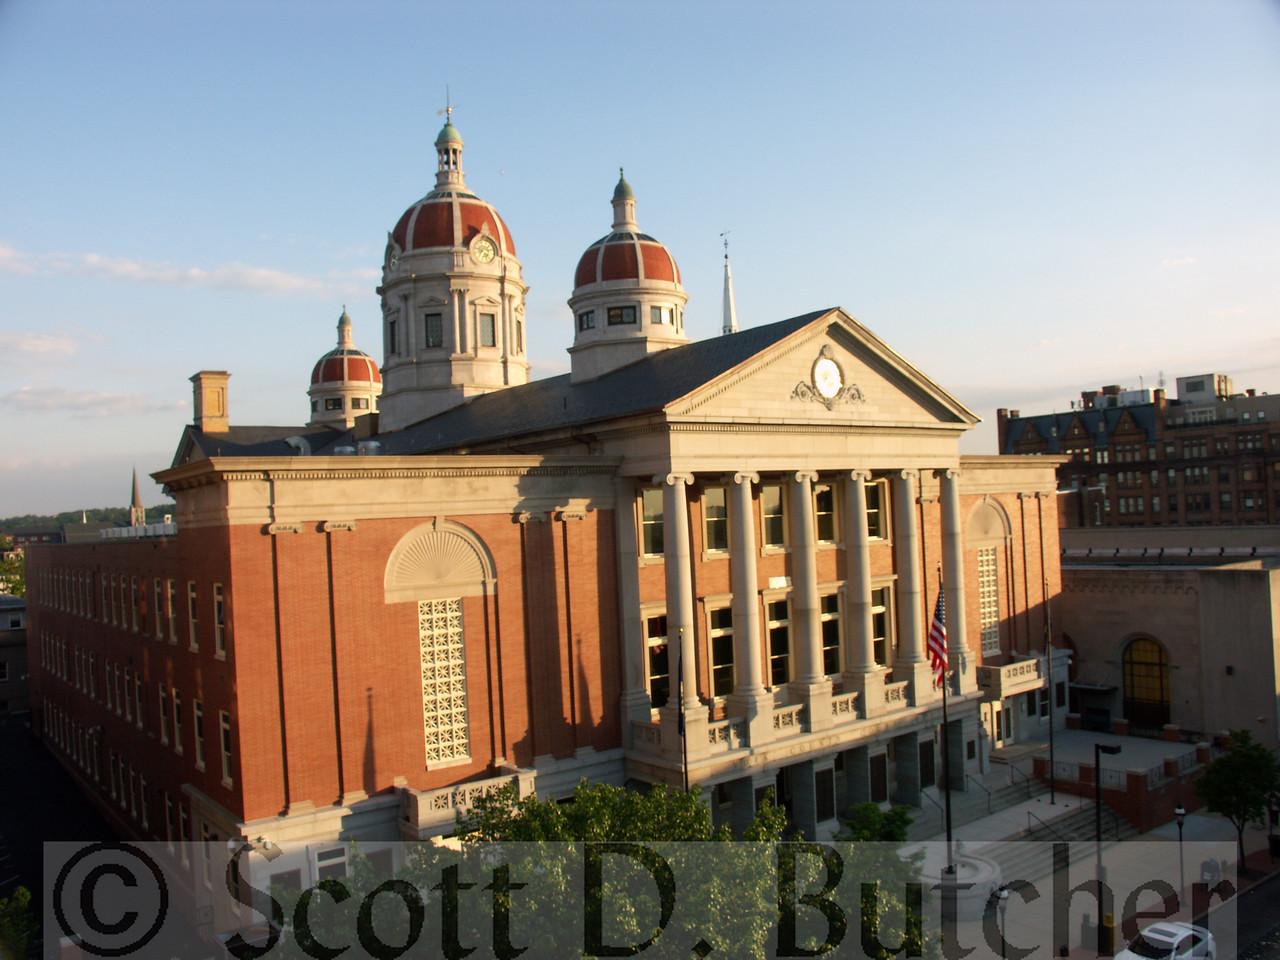 York County Court House